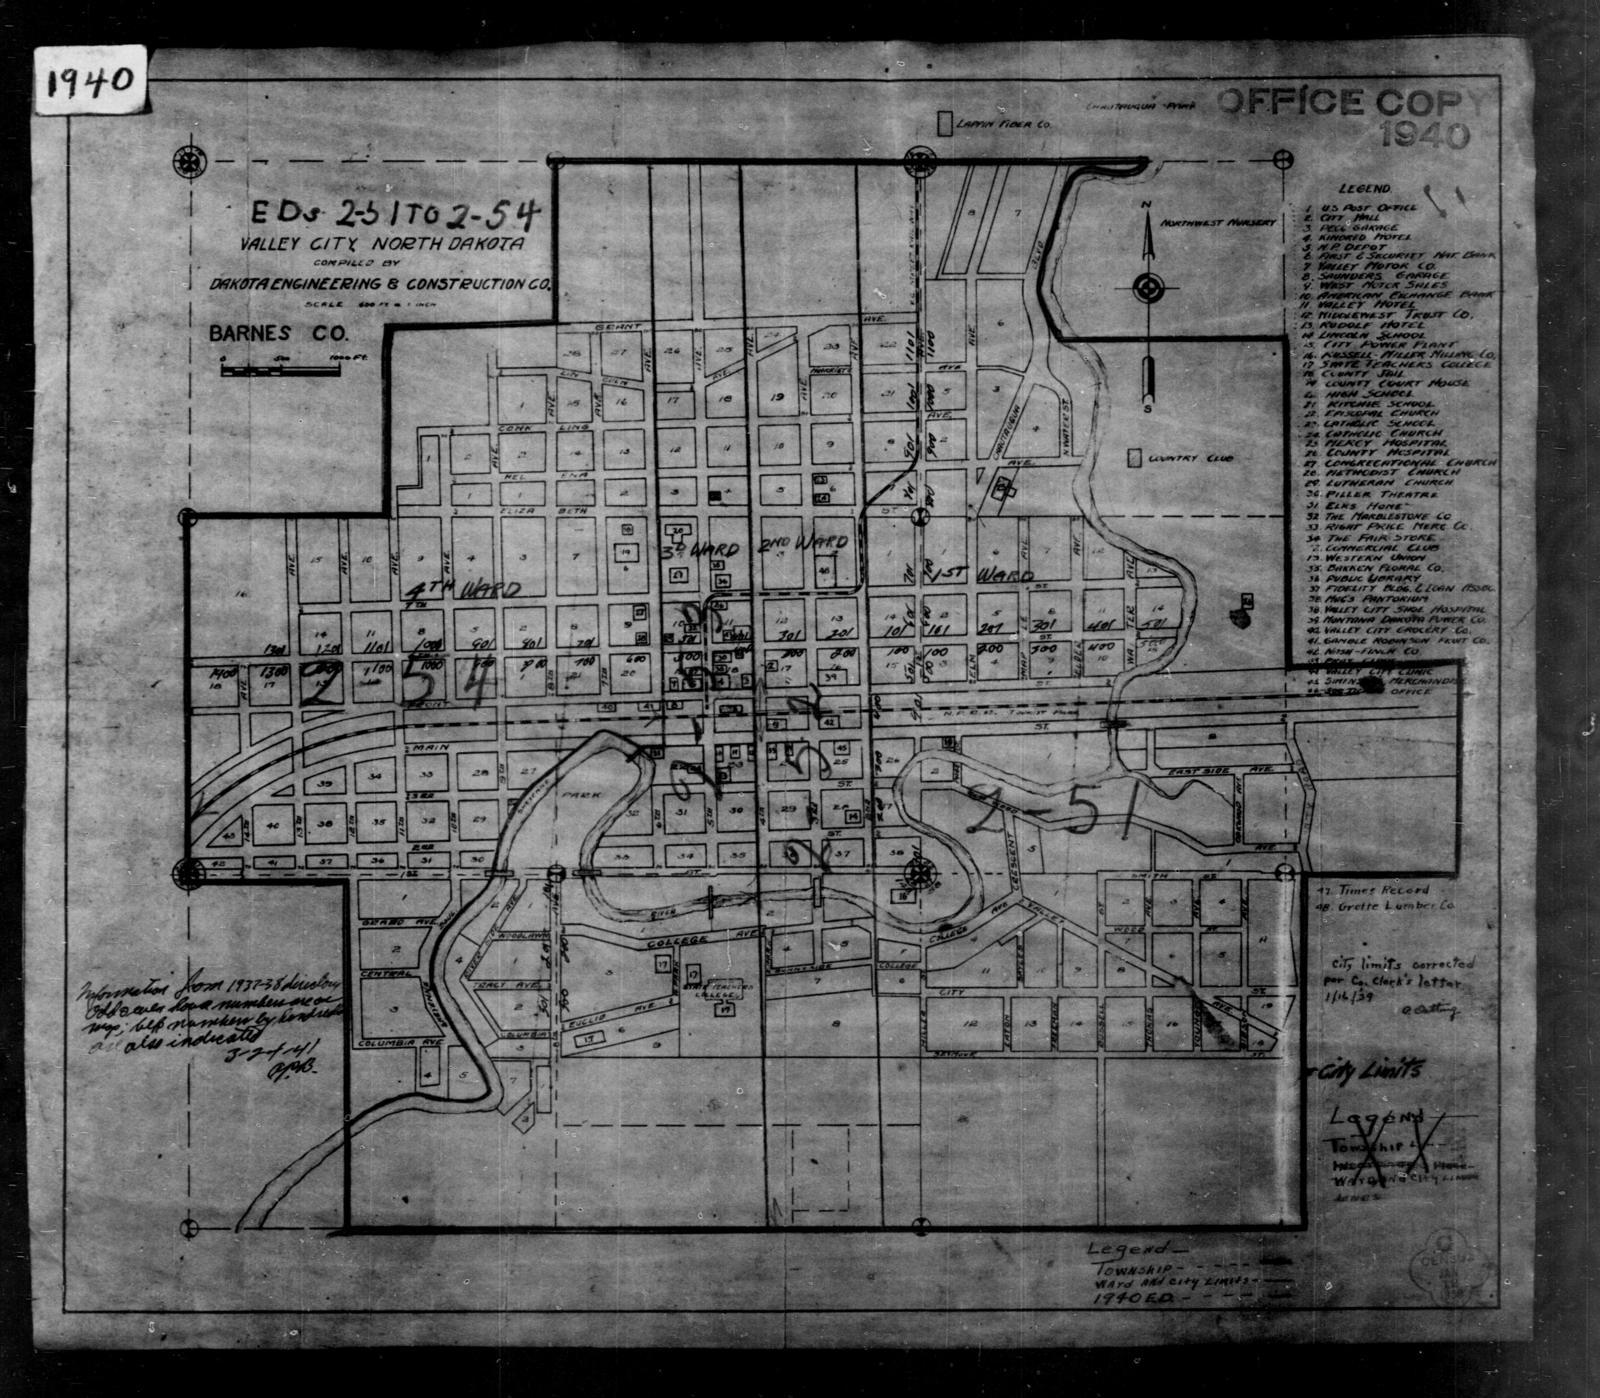 map of belfield north dakota, map of barnes county nd, map of mandan north dakota, map of bismarck north dakota, map of jamestown north dakota, map of lisbon north dakota, map of minot north dakota, map of united states north dakota, map of finley north dakota, map of carrington north dakota, map of wahpeton north dakota, on map of barnes county north dakota